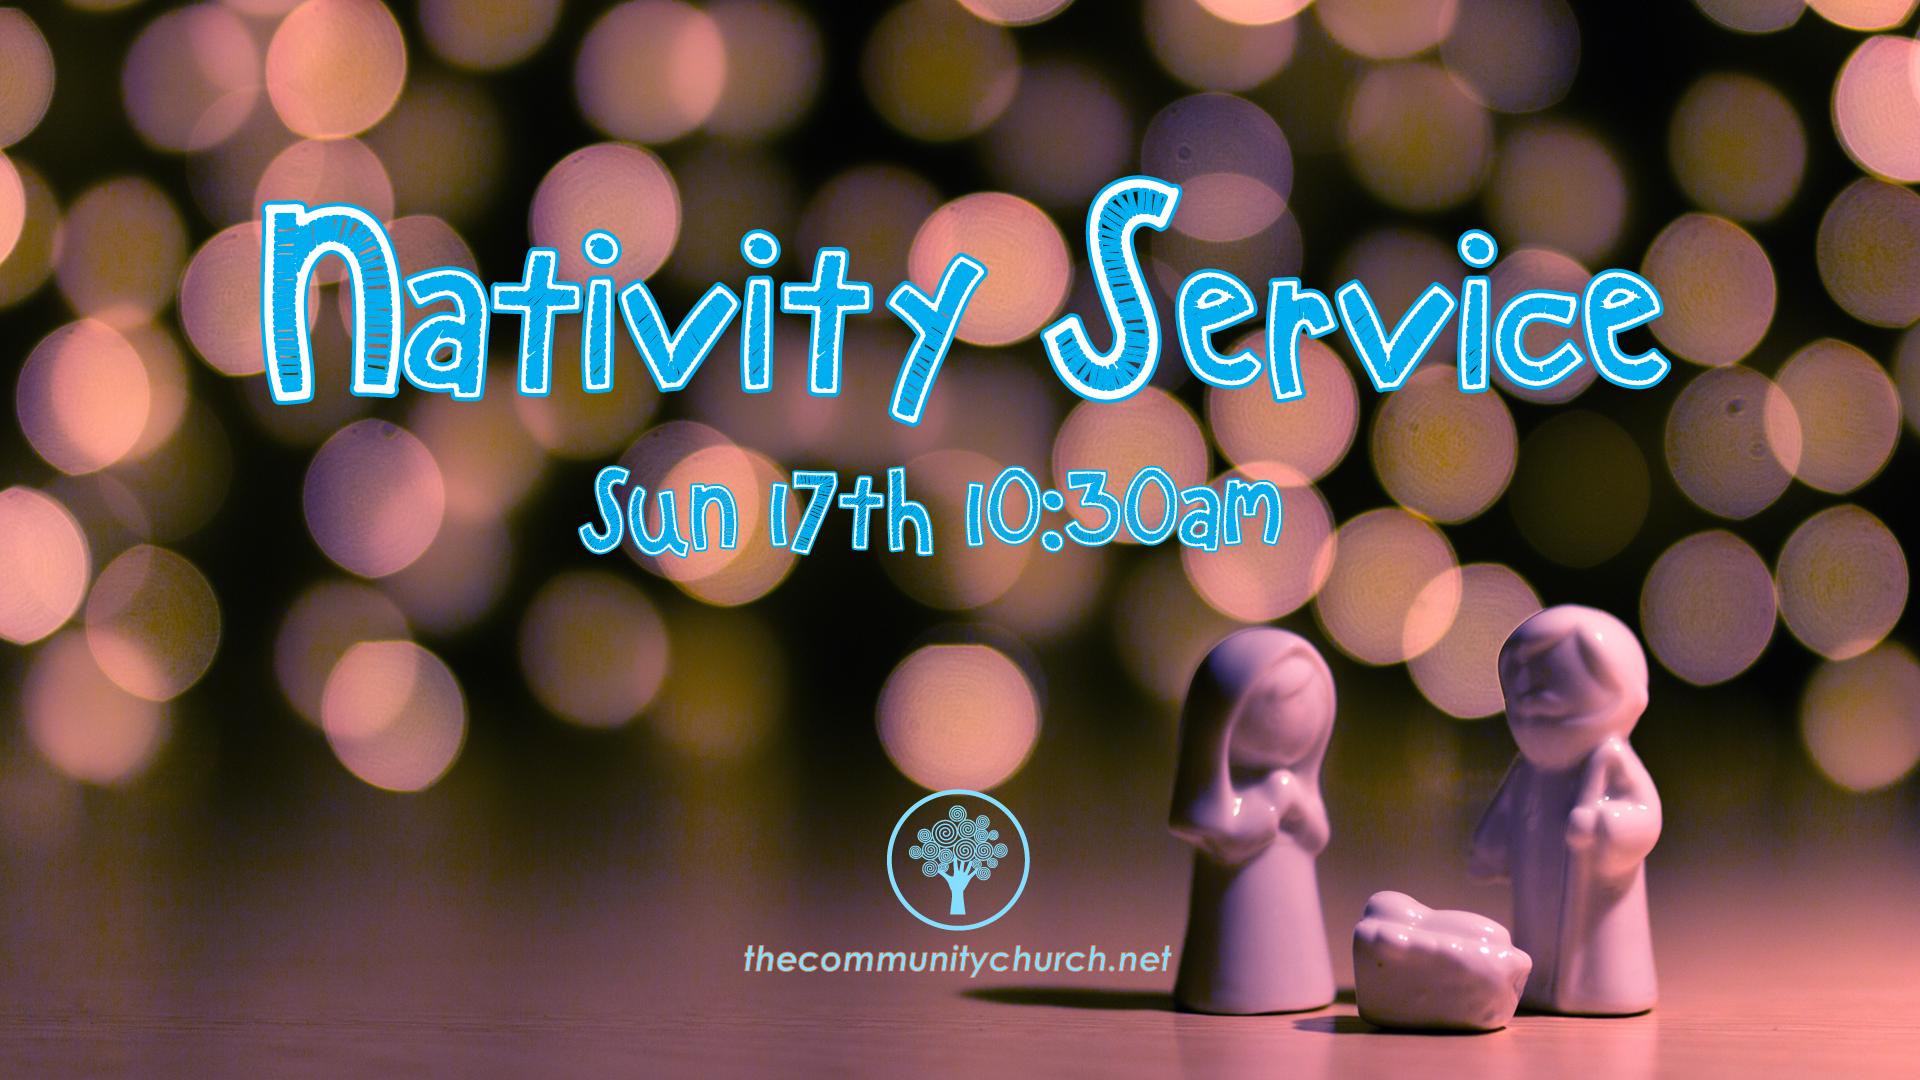 NativityService.png